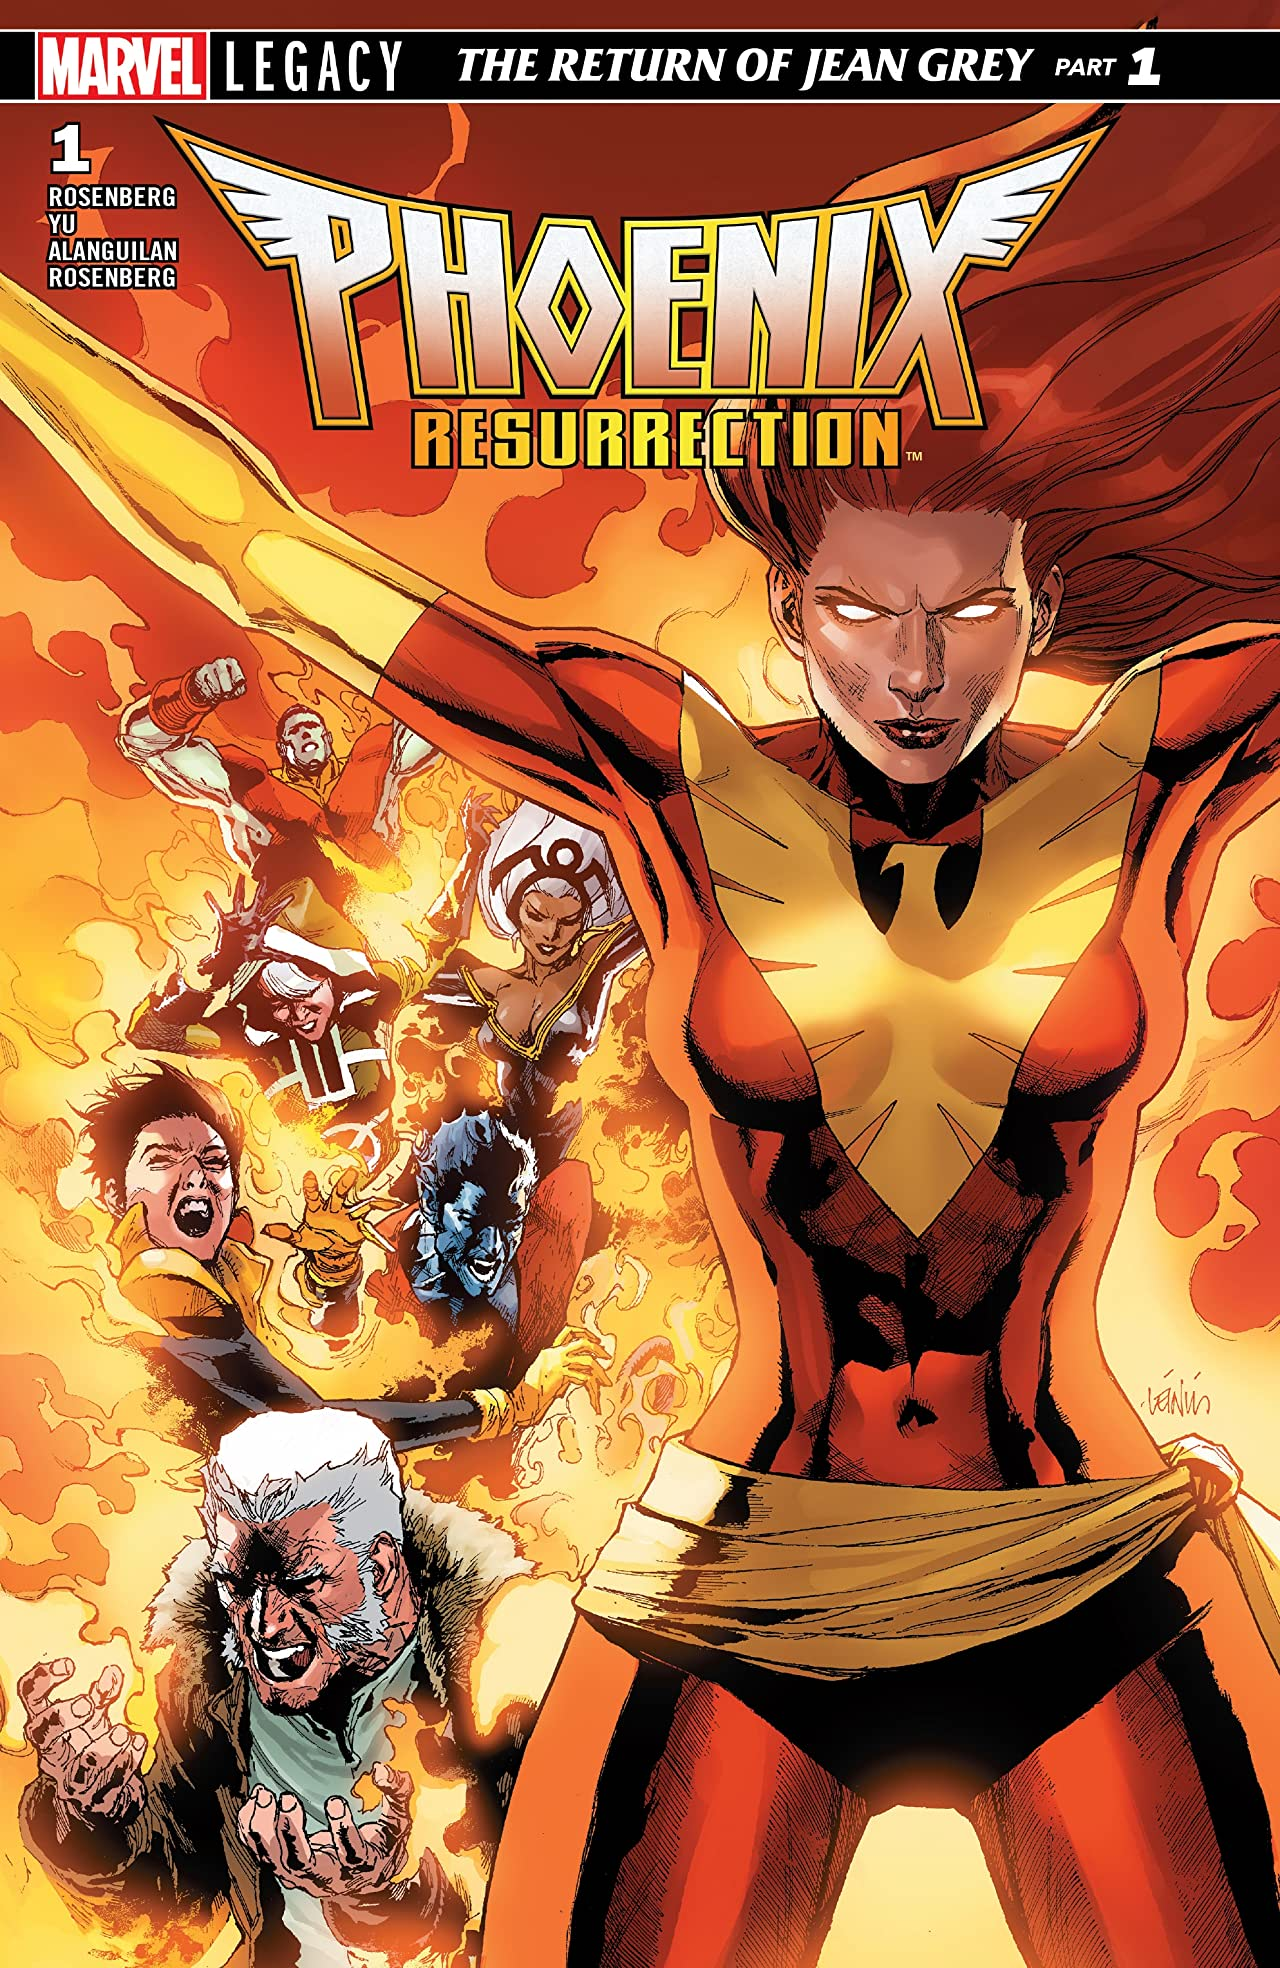 Phoenix Resurrection: The Return Of Jean Grey (2017-2018) #1 (of 5)